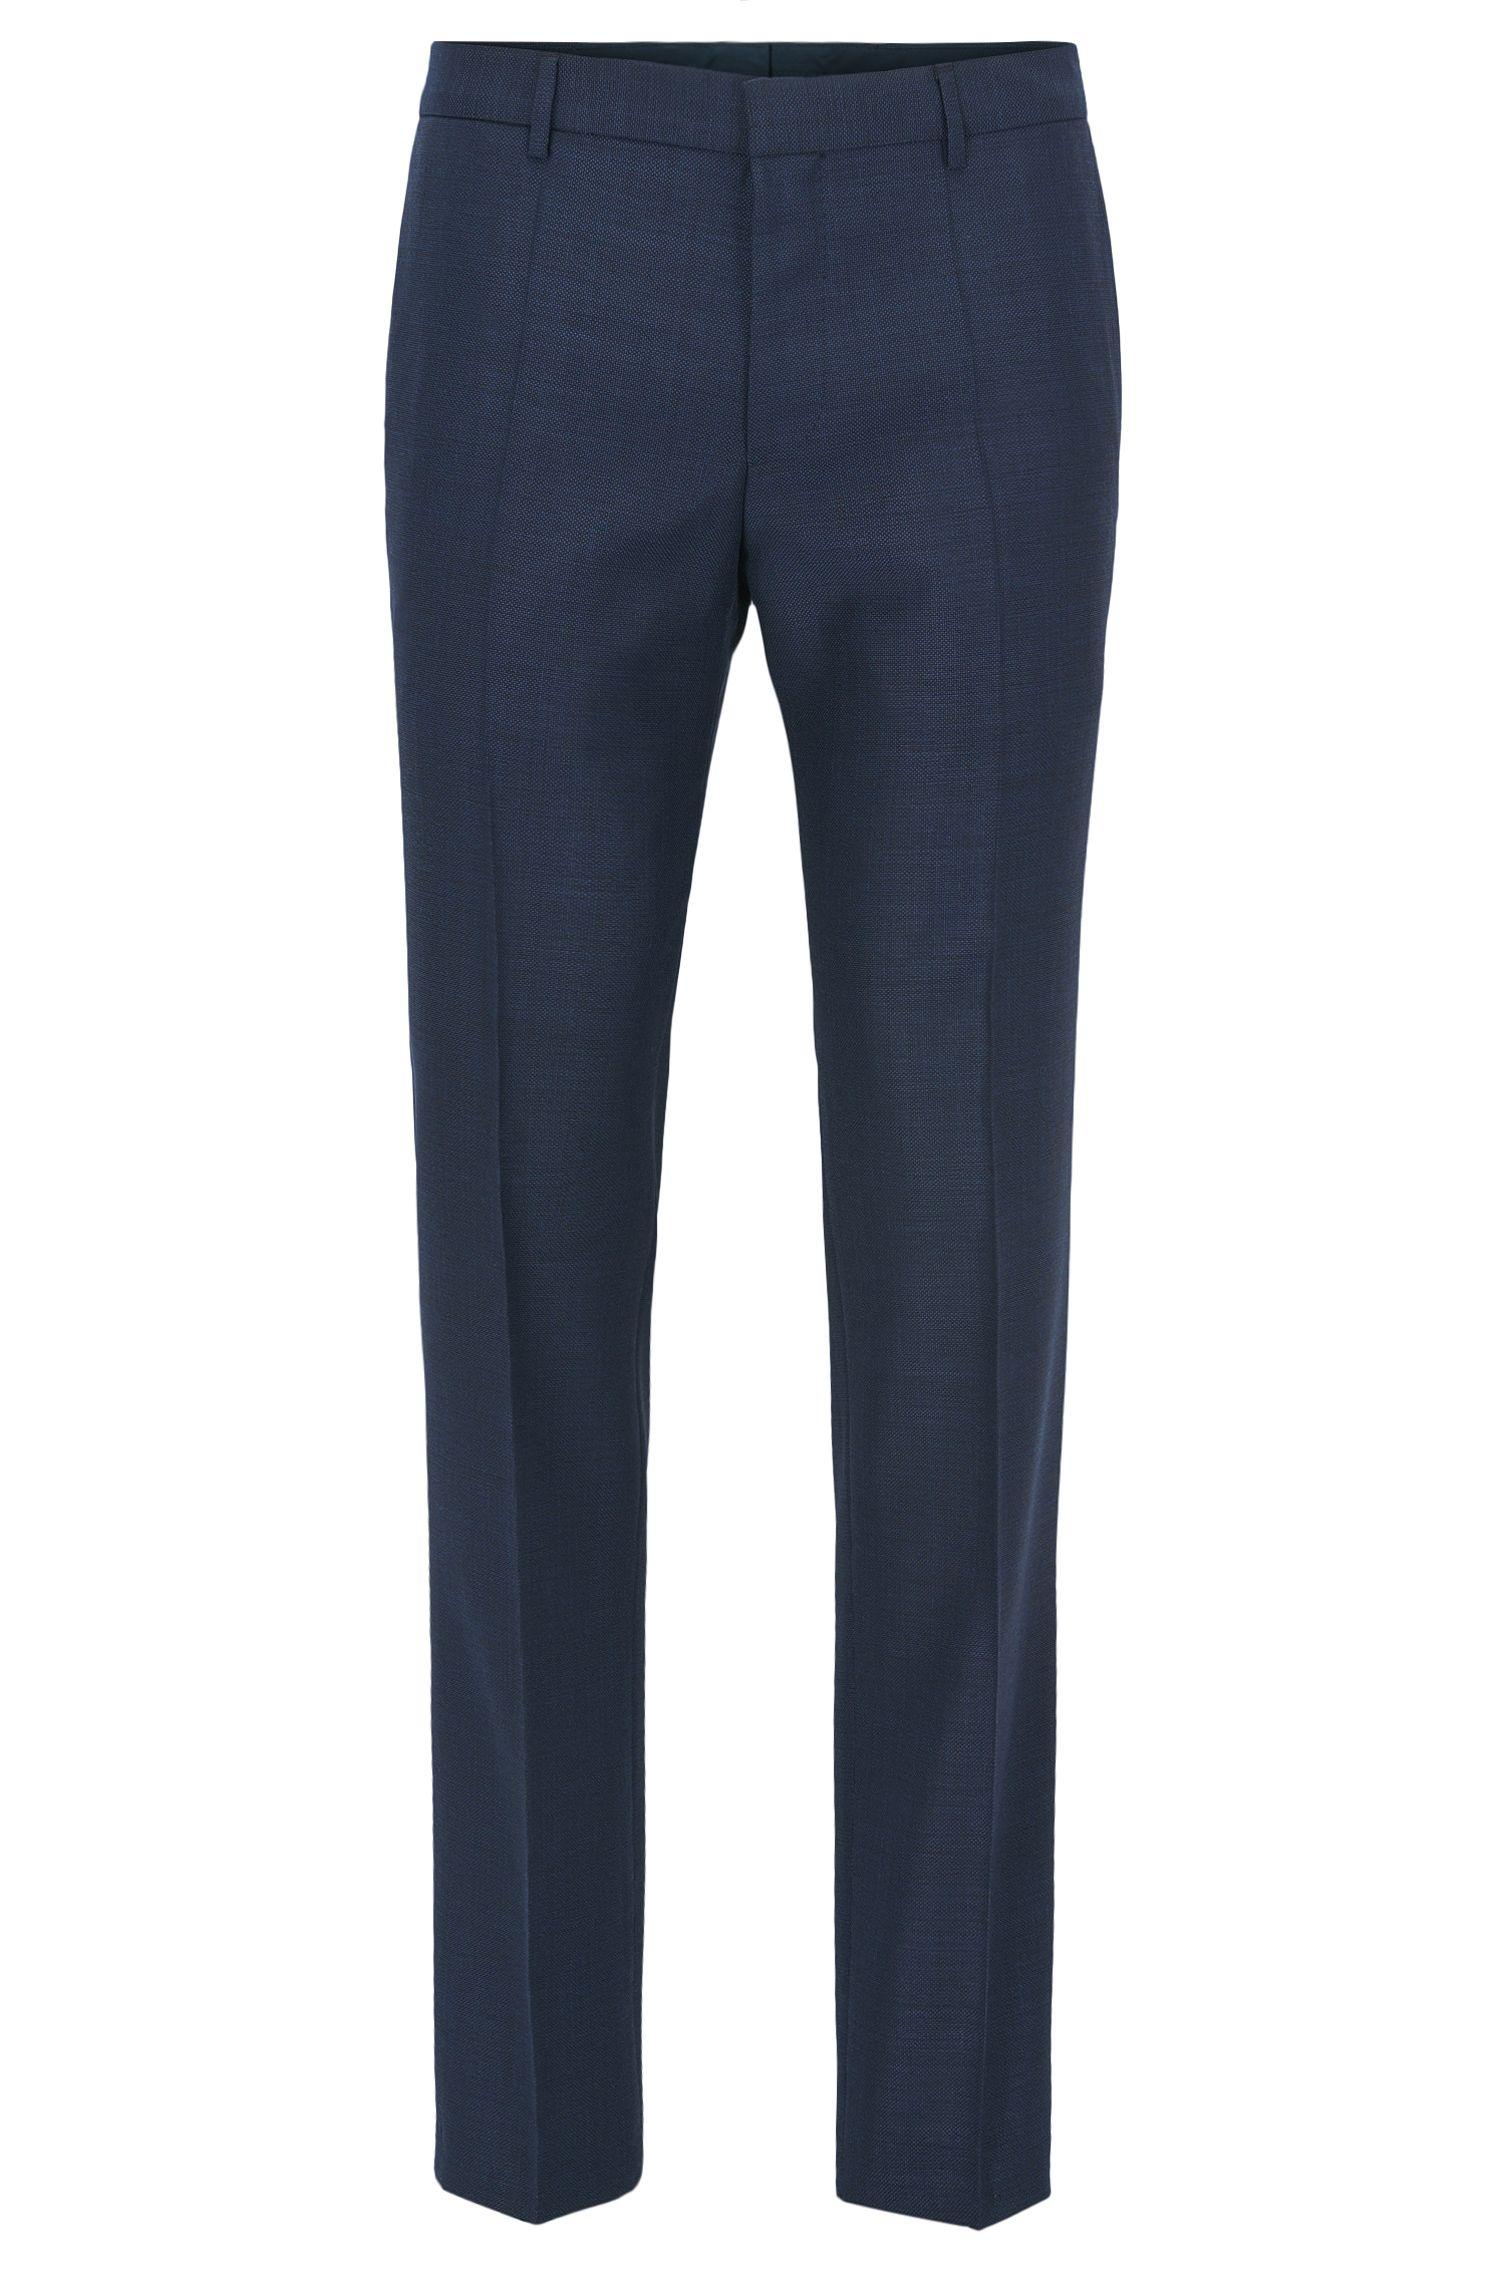 Piped Virgin Wool Dress Pant, Slim Fit | Blake